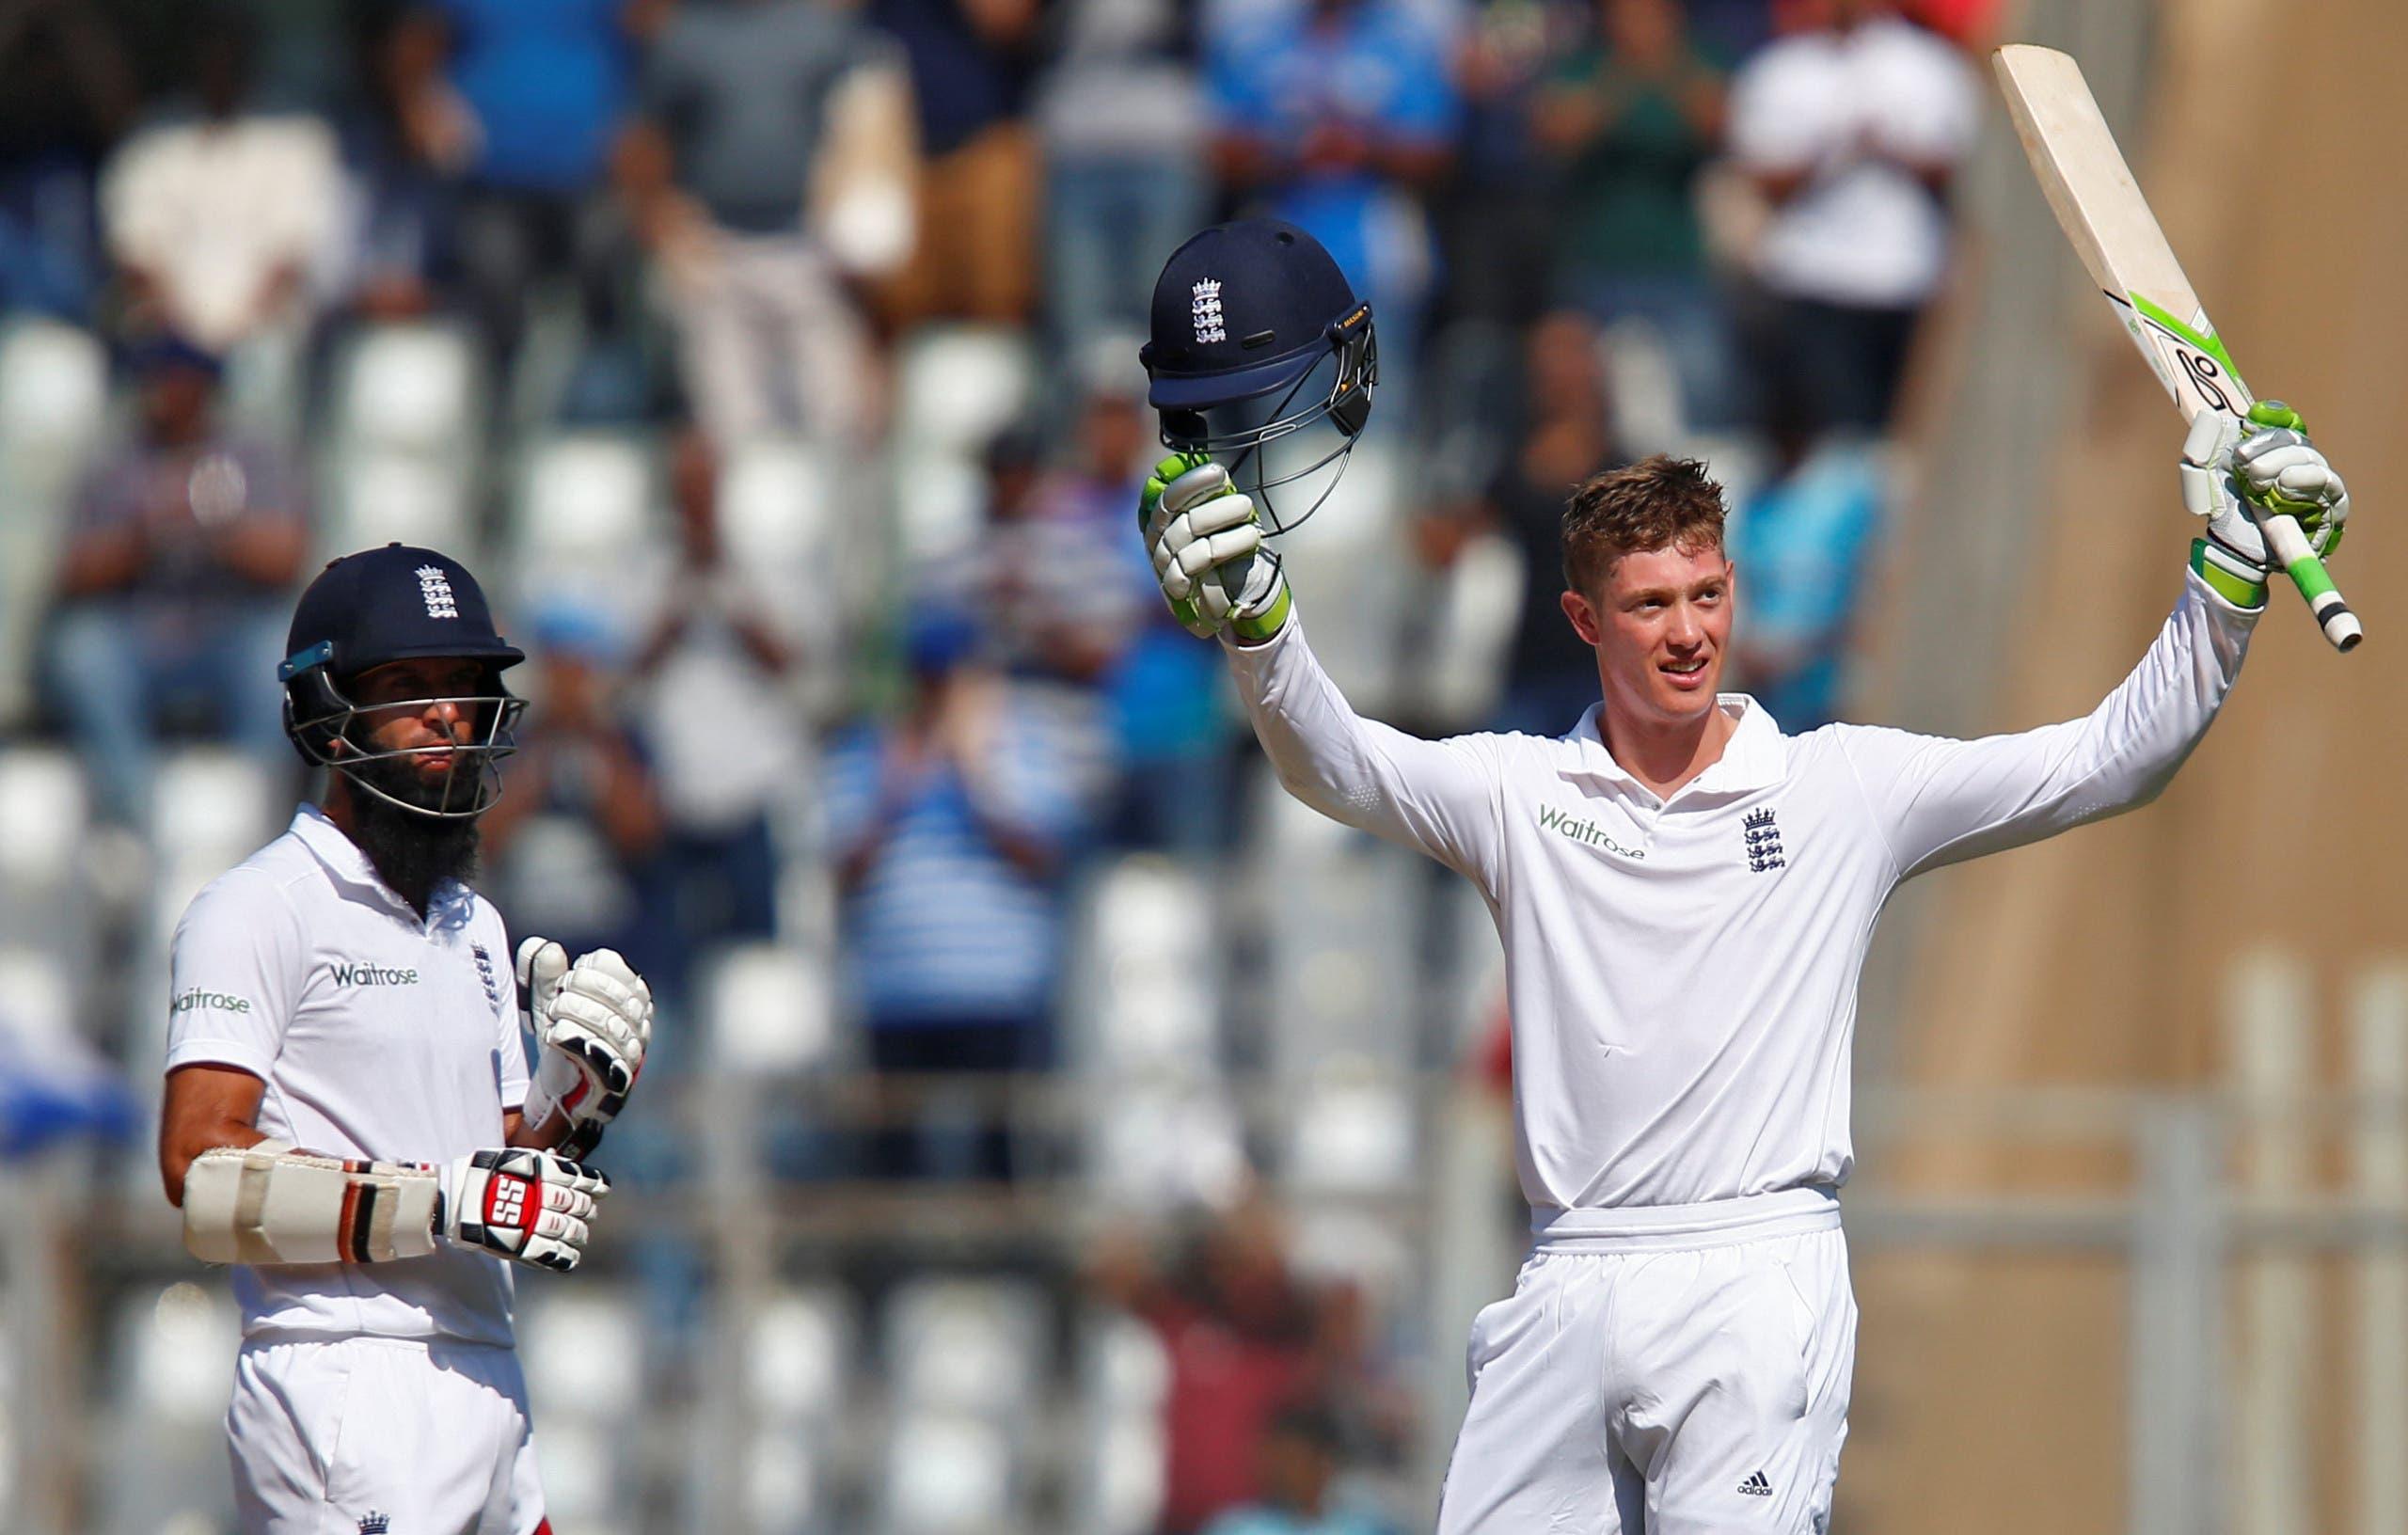 England's Keaton Jennings (right) celebrates his century as his team mate Moeen Ali looks on. (Reuters)